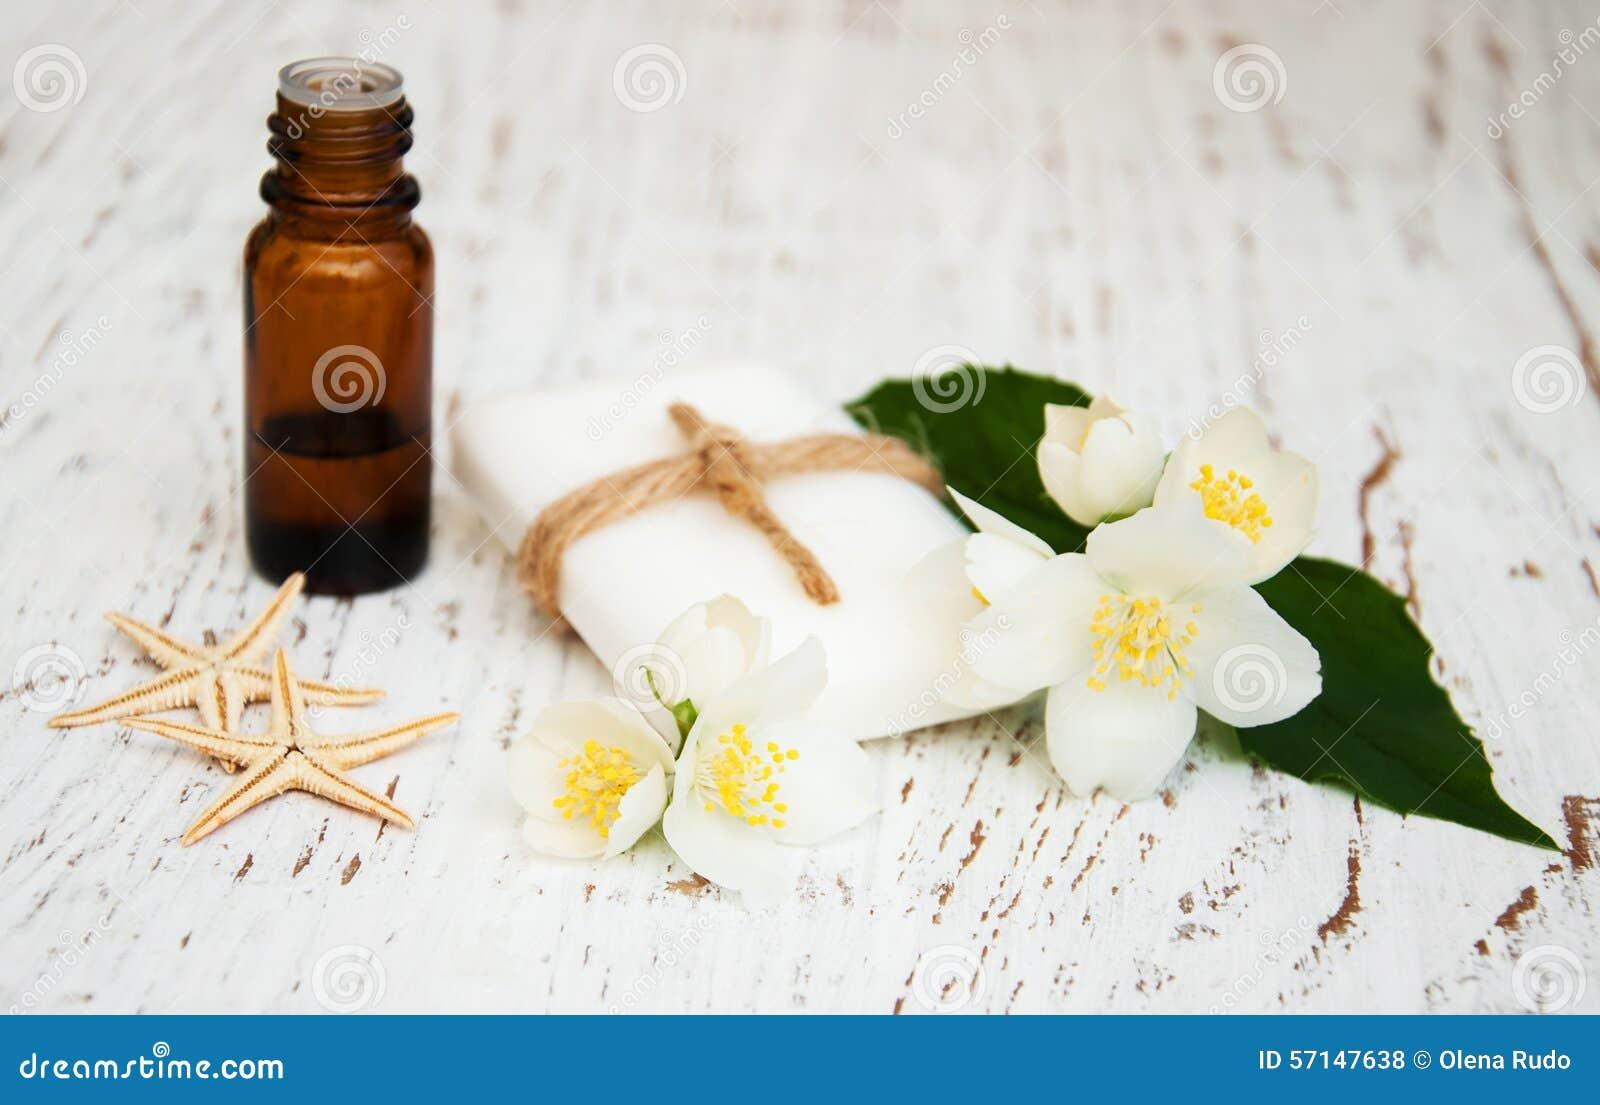 Jasmine Flower Soap Stock Photos Download 363 Images